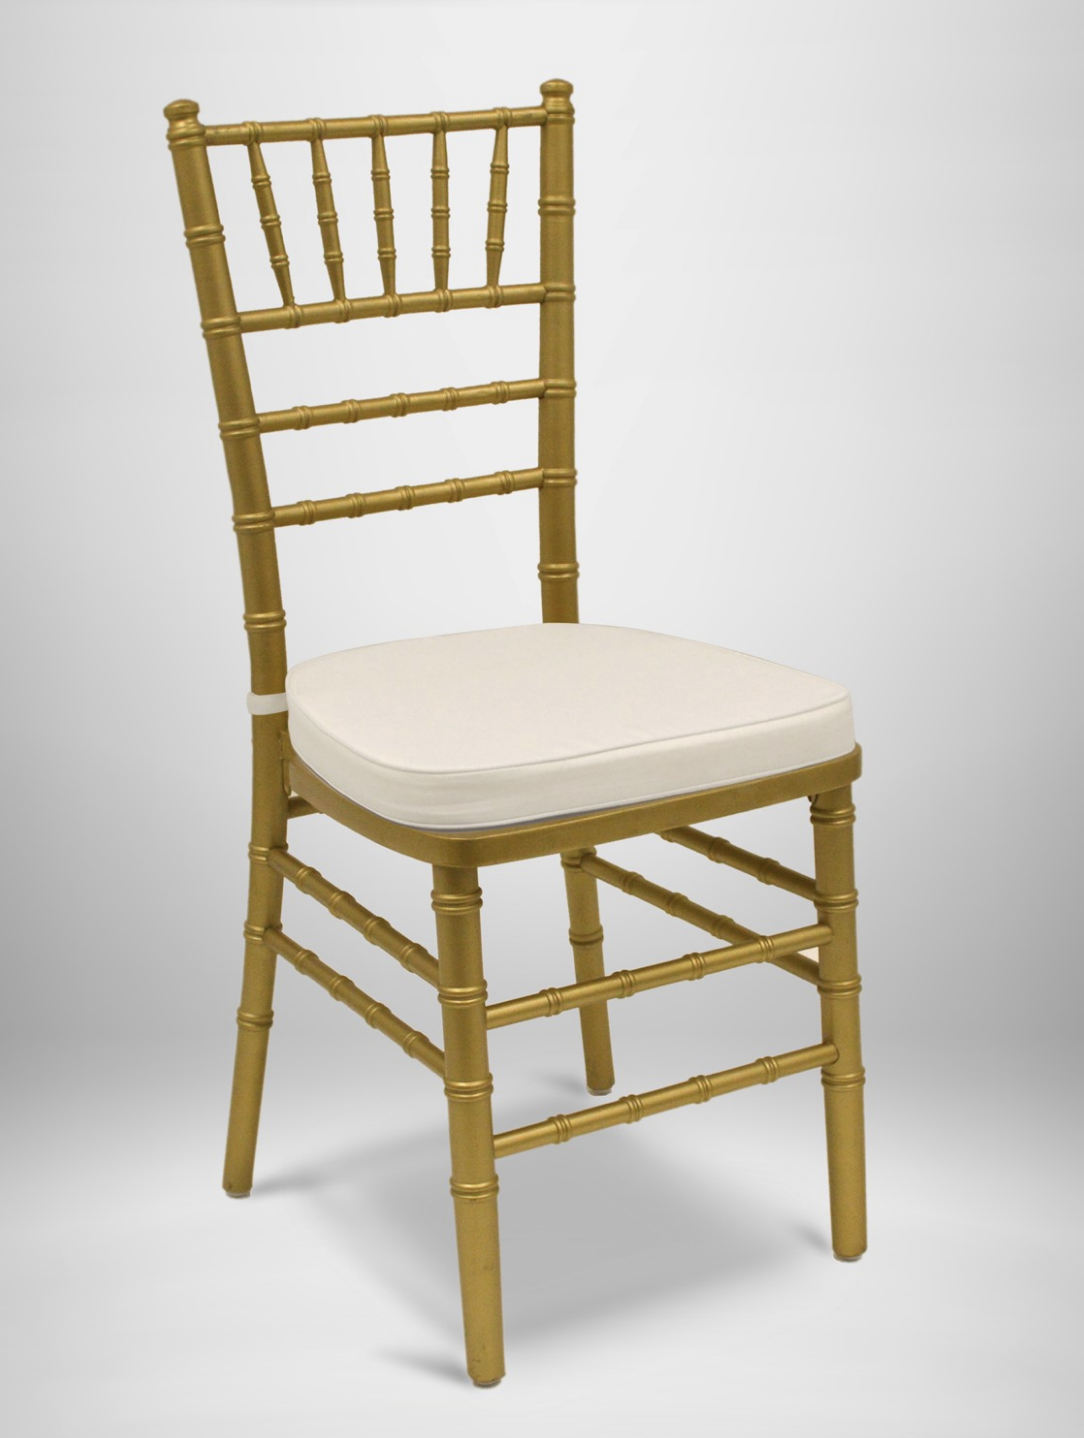 Gold Chiavari Chairs with Pads